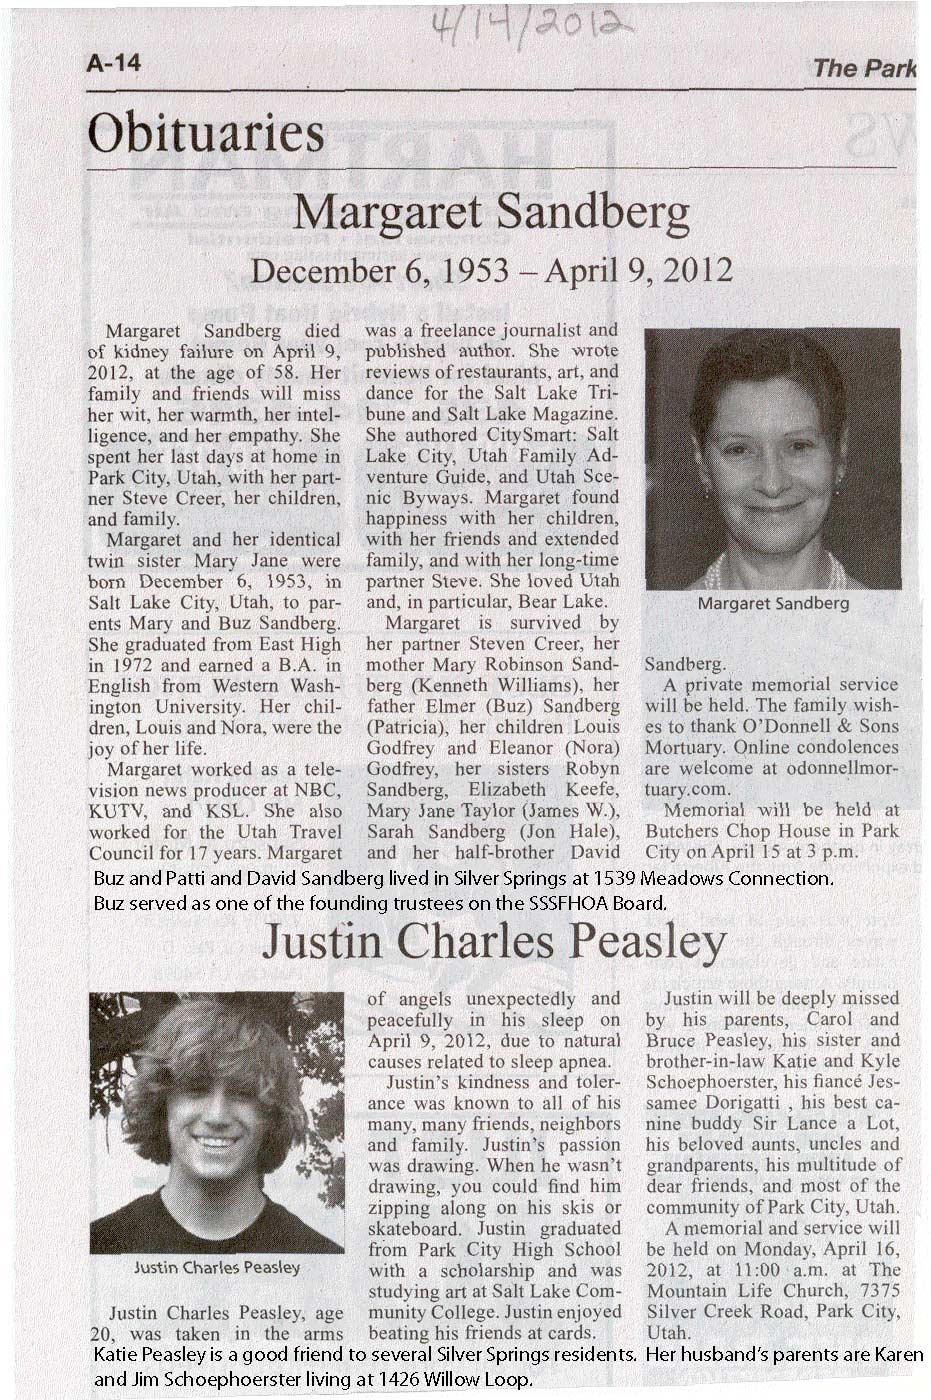 2012 April 9 Sandberg and Peasley Obits